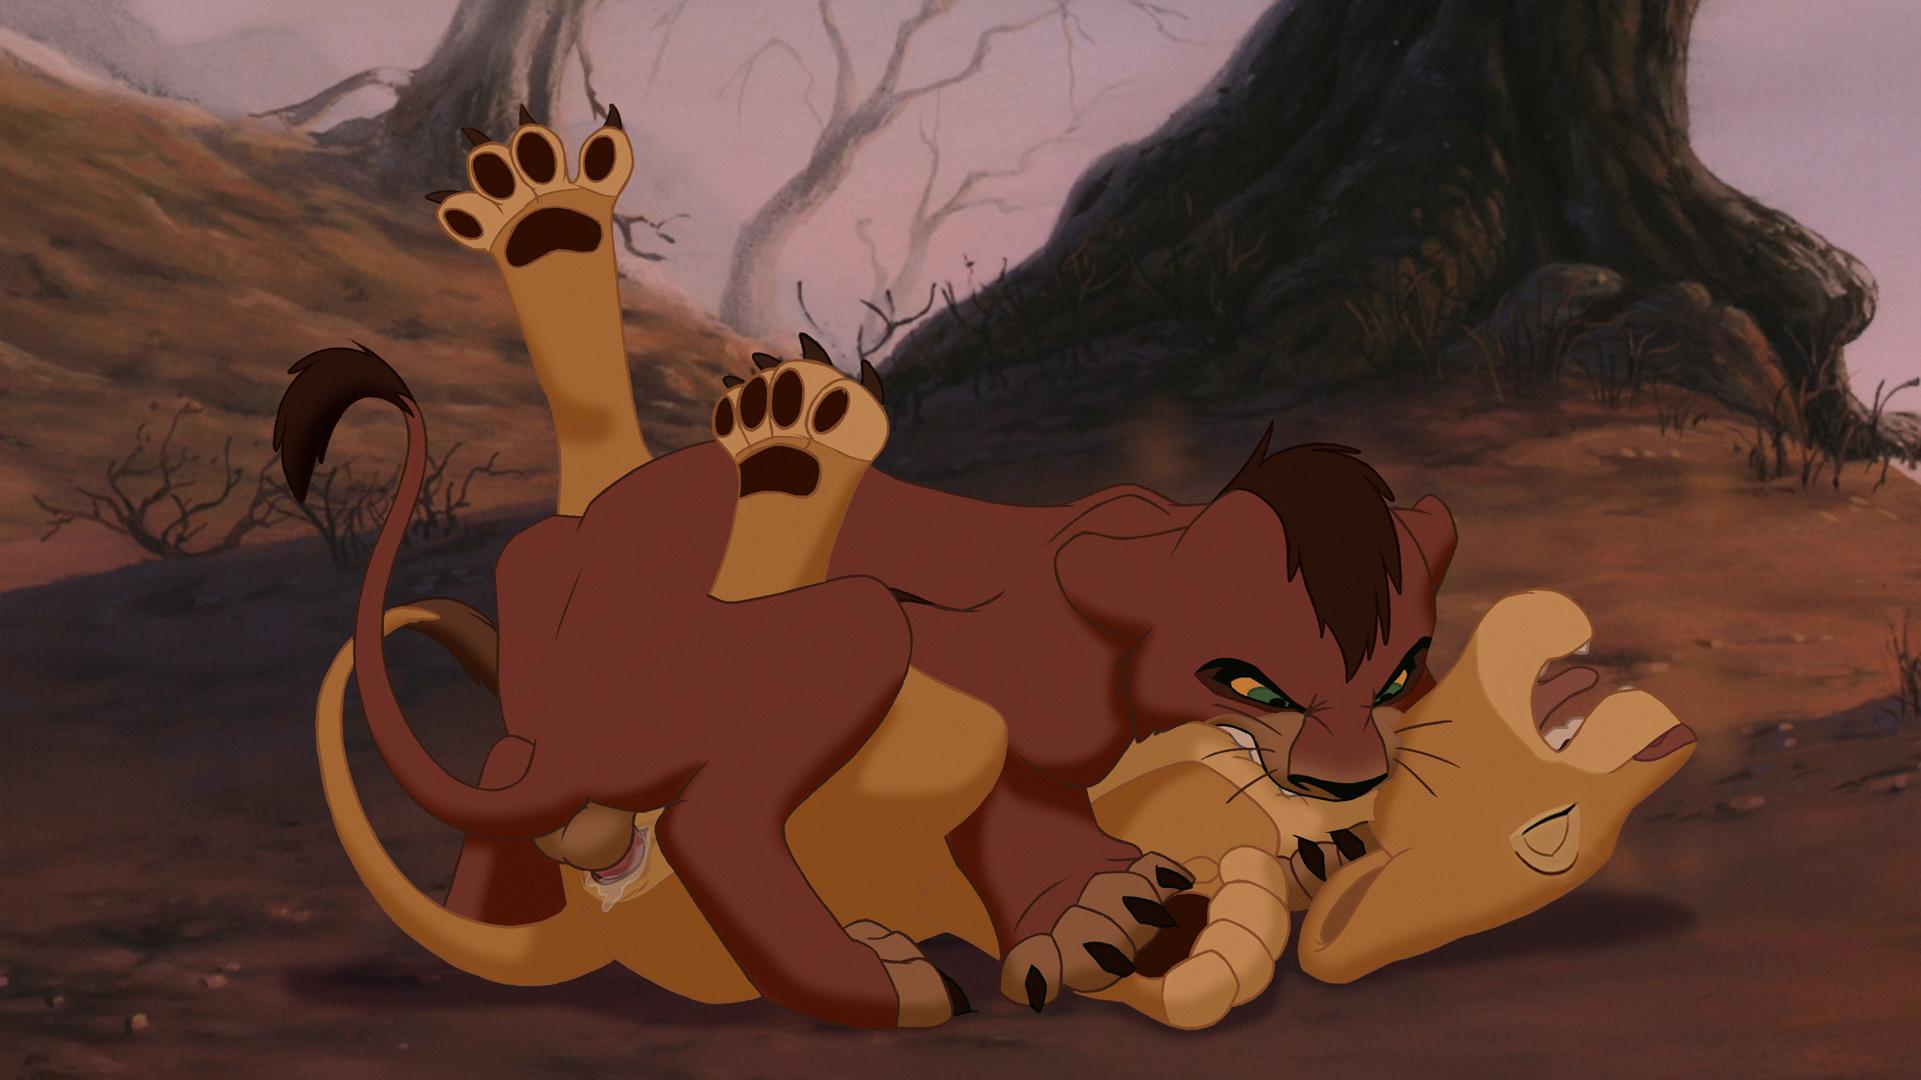 Бледном порно картинки король лев